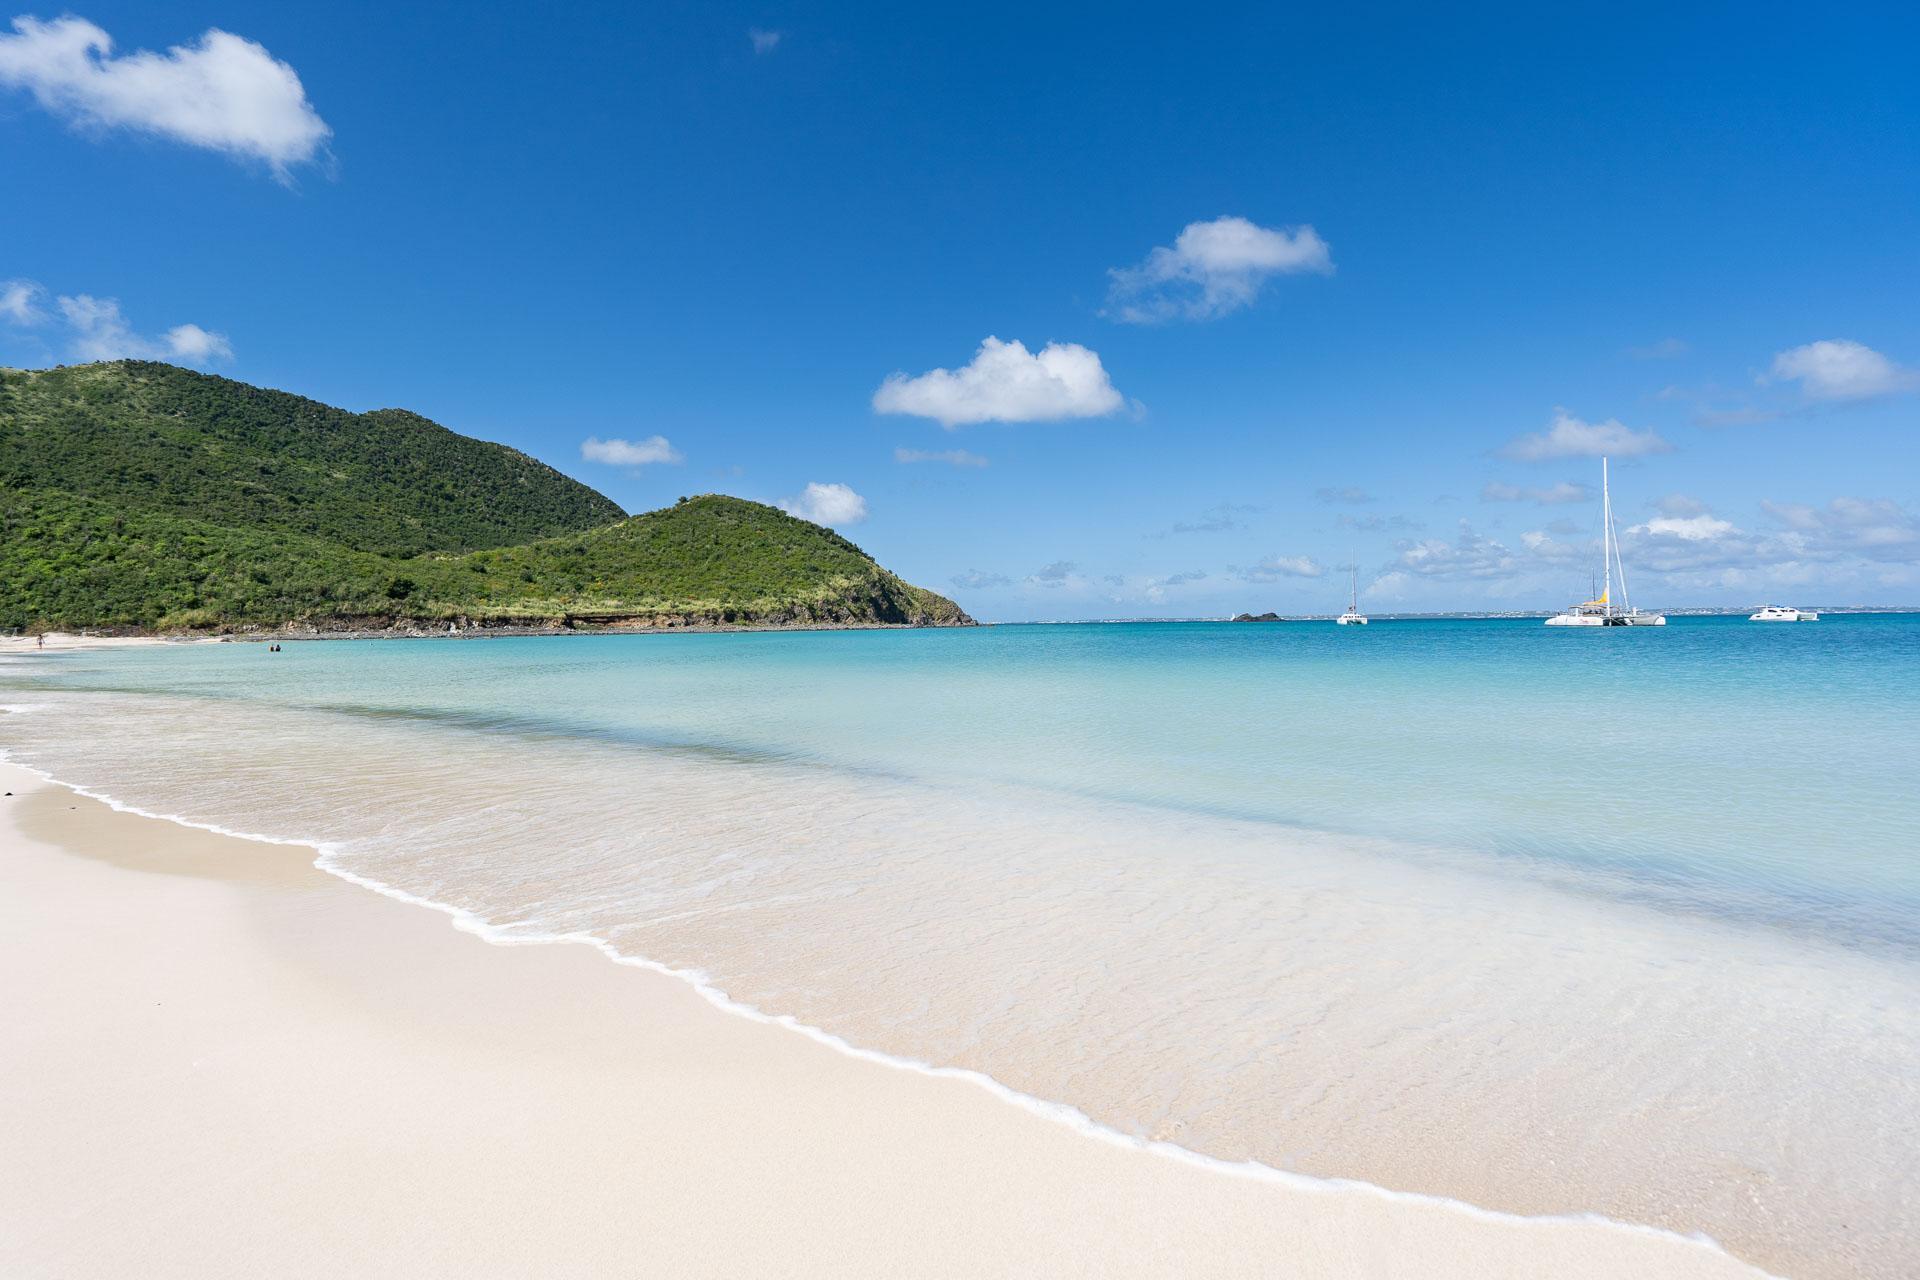 La plage de l'Anse Marcel © Donovane Tremor